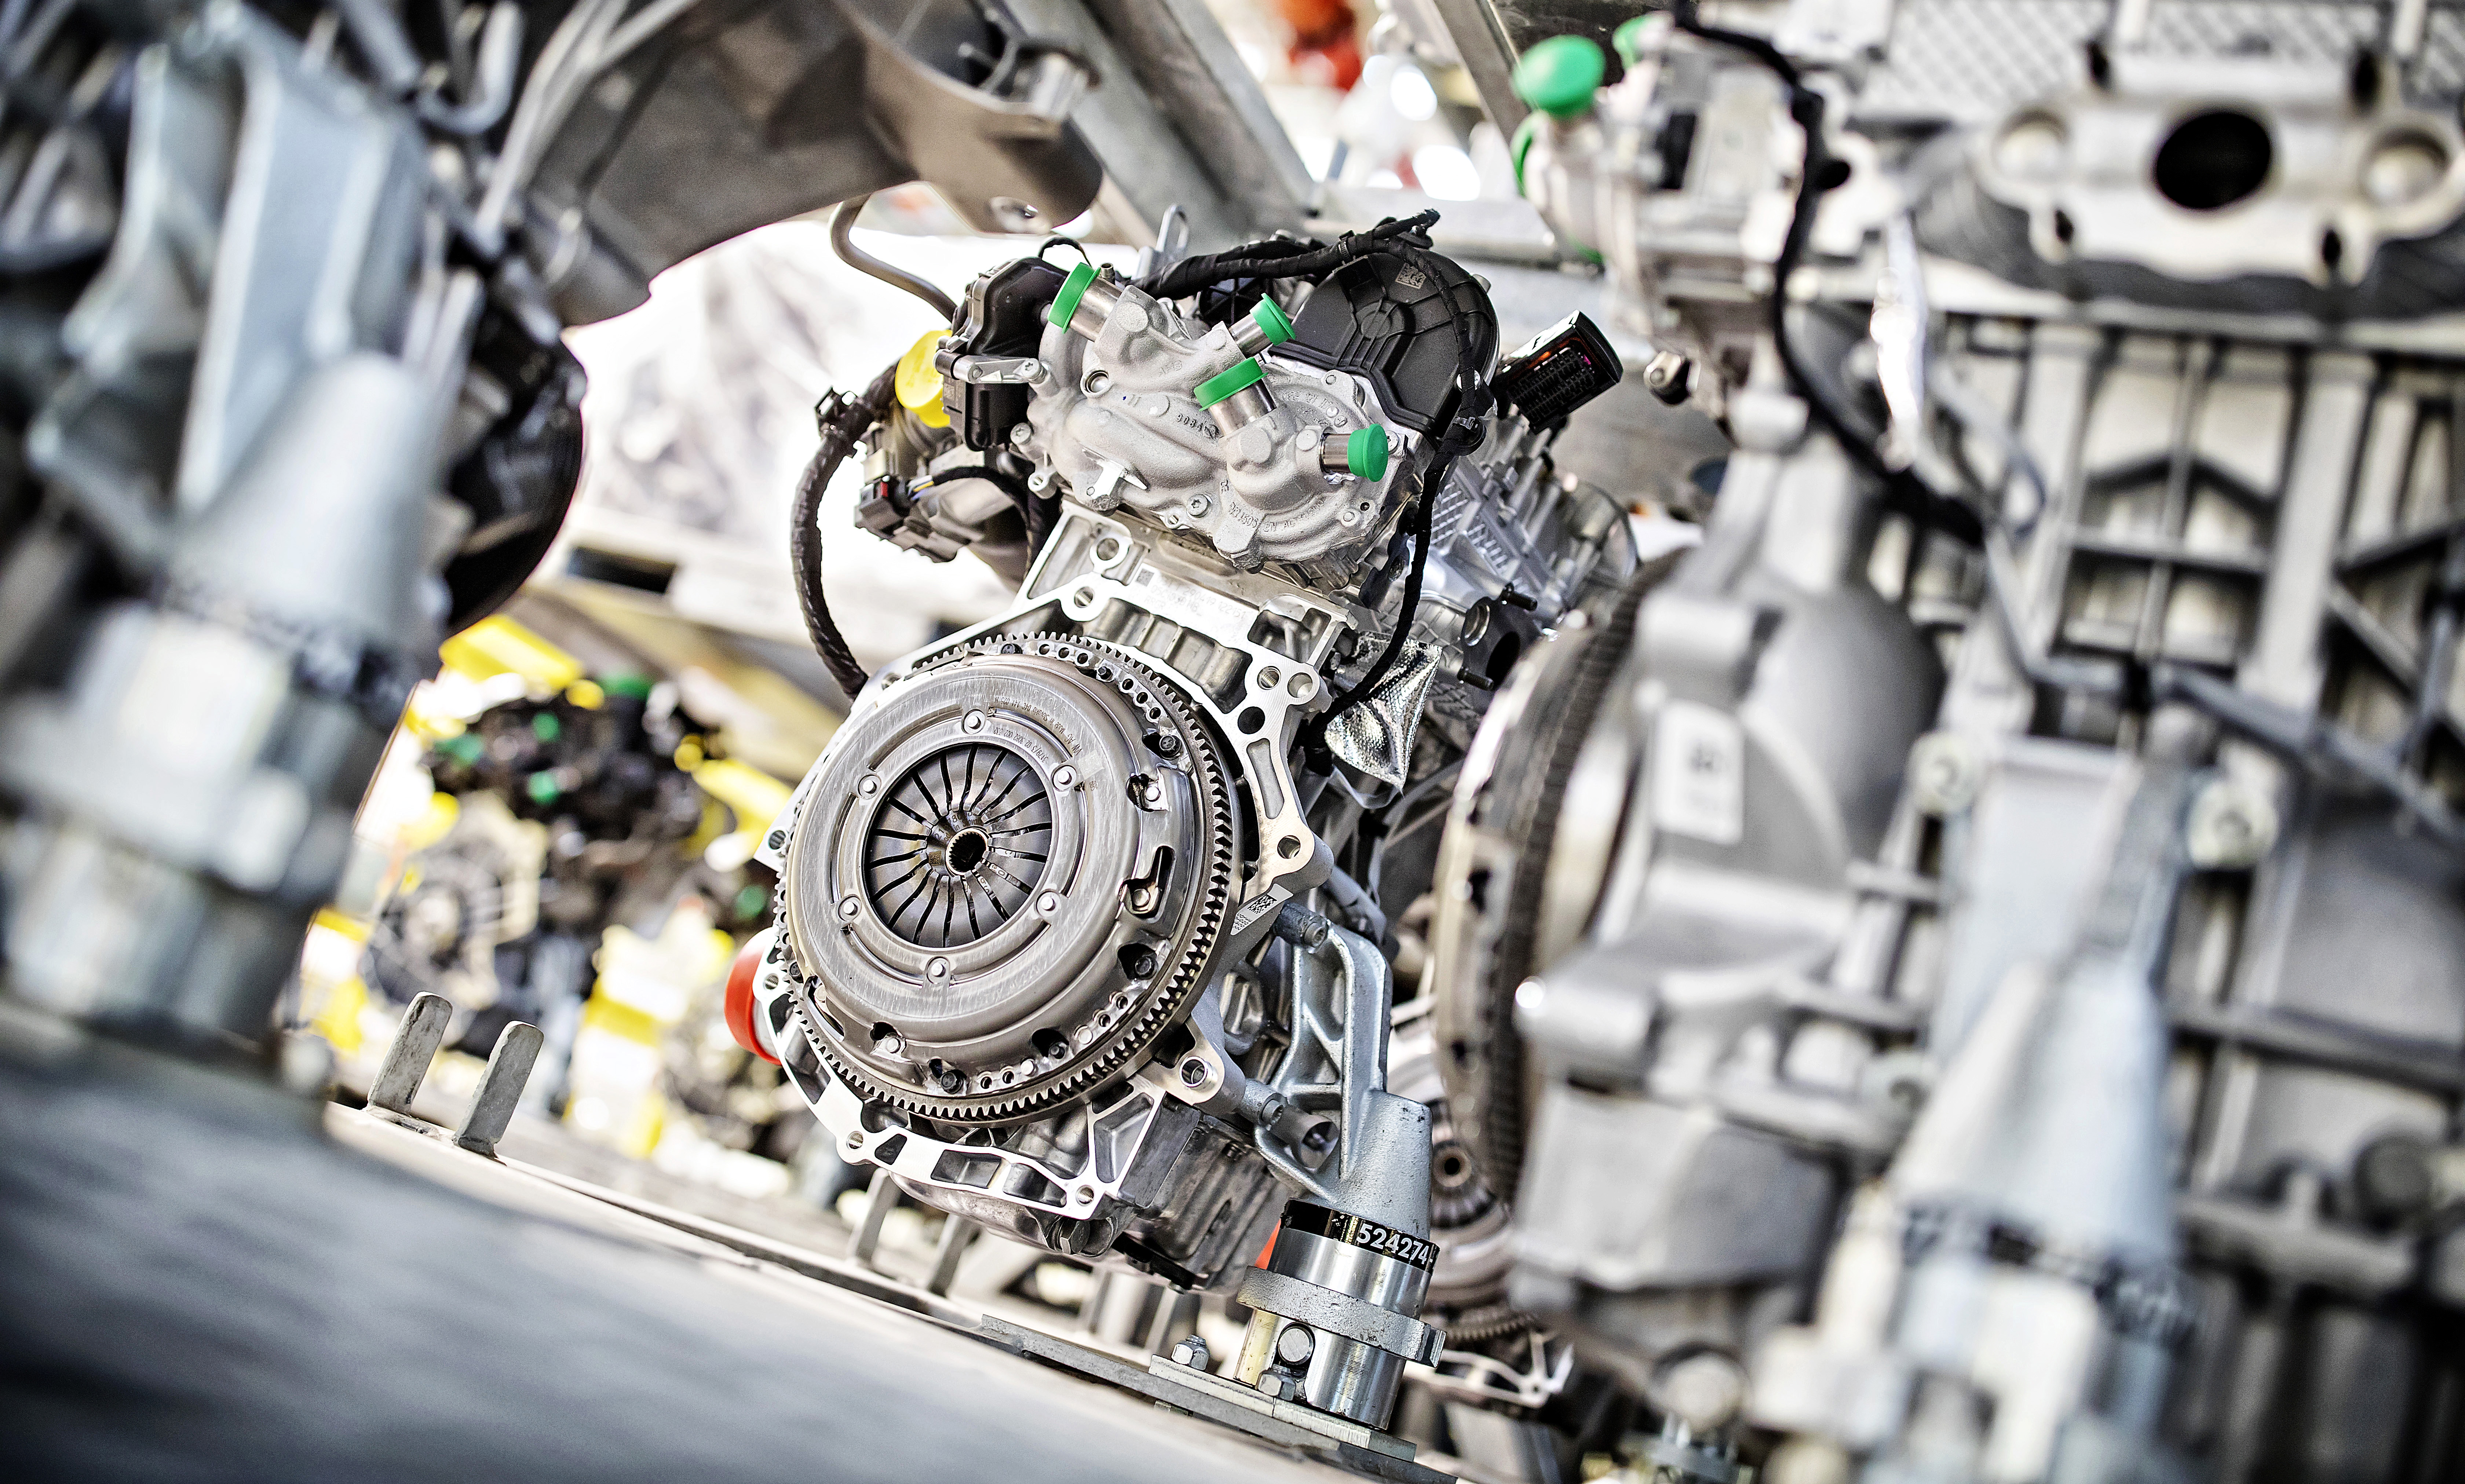 Production milestone reached in Mladá Boleslav: SKODA AUTO manufactures 3 millionth EA211 engine - Image 1